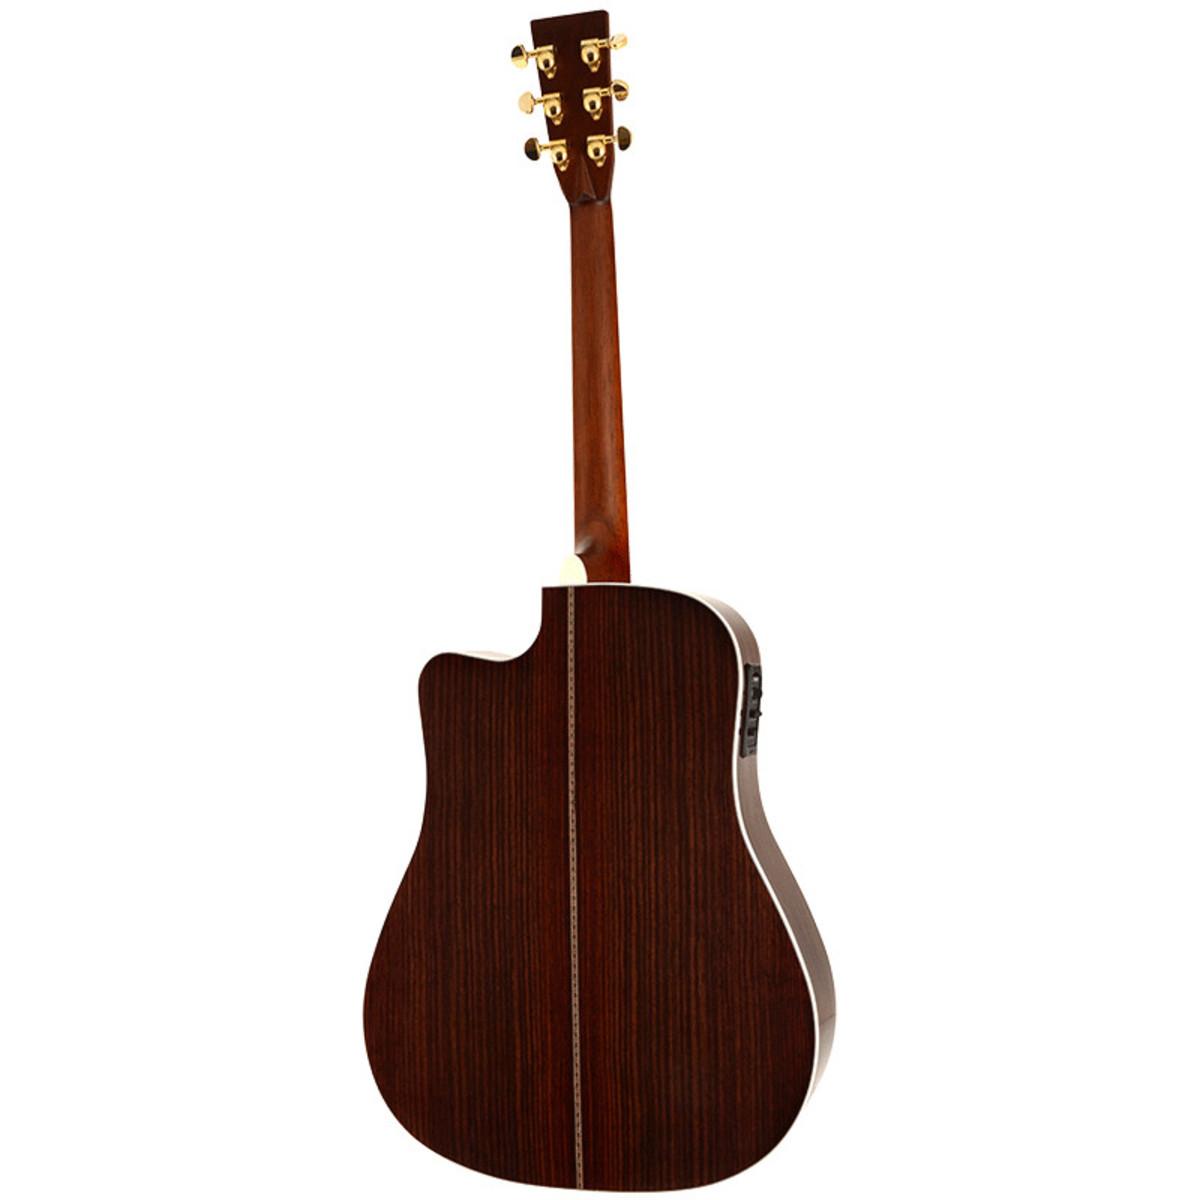 guitare lectro acoustique de sigma rdc 41f naturel. Black Bedroom Furniture Sets. Home Design Ideas